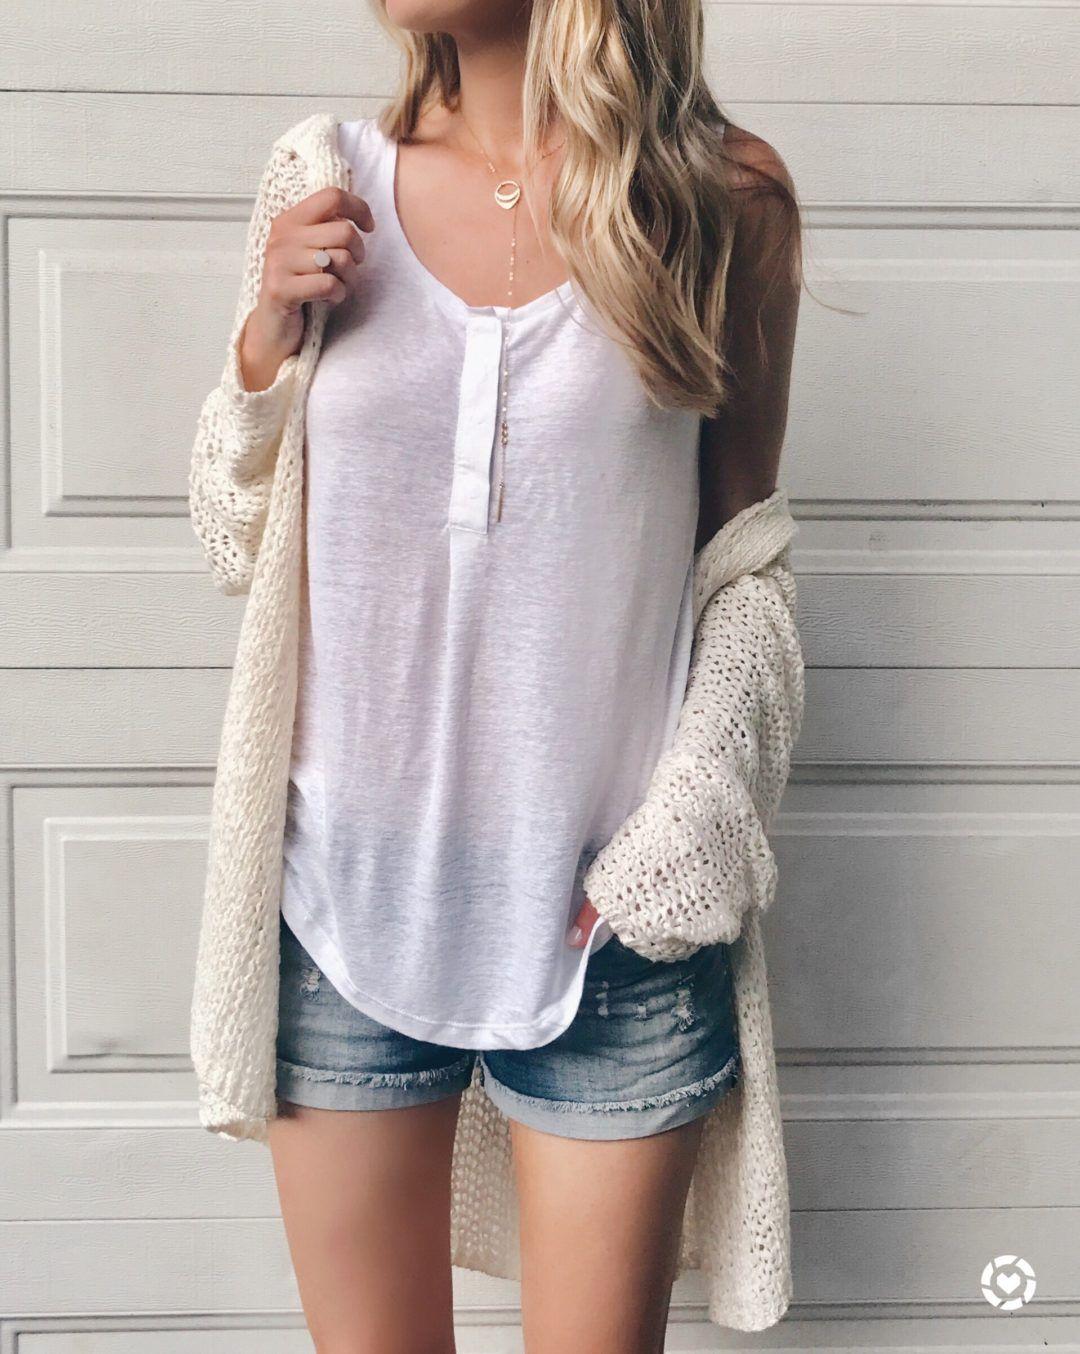 a3feda0bb2e Summer Sale Outfit Favorites via Pinteresting Plans Instagram ...